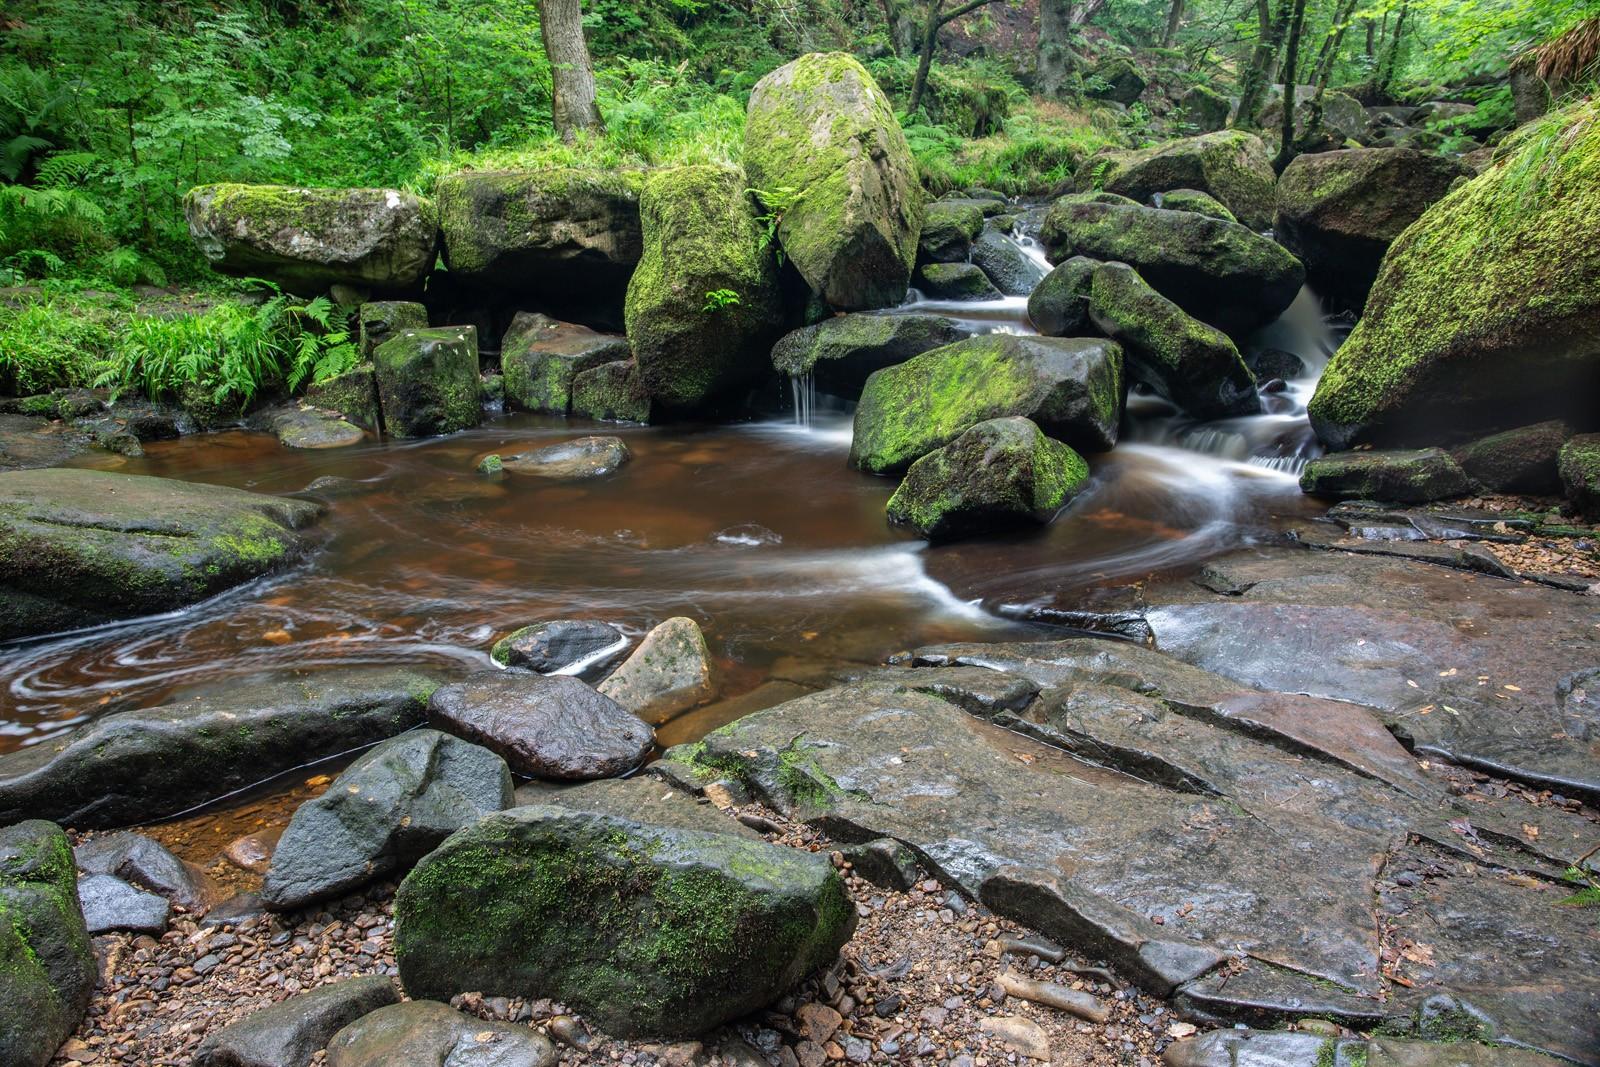 13. Swirling Water, Padley Gorge